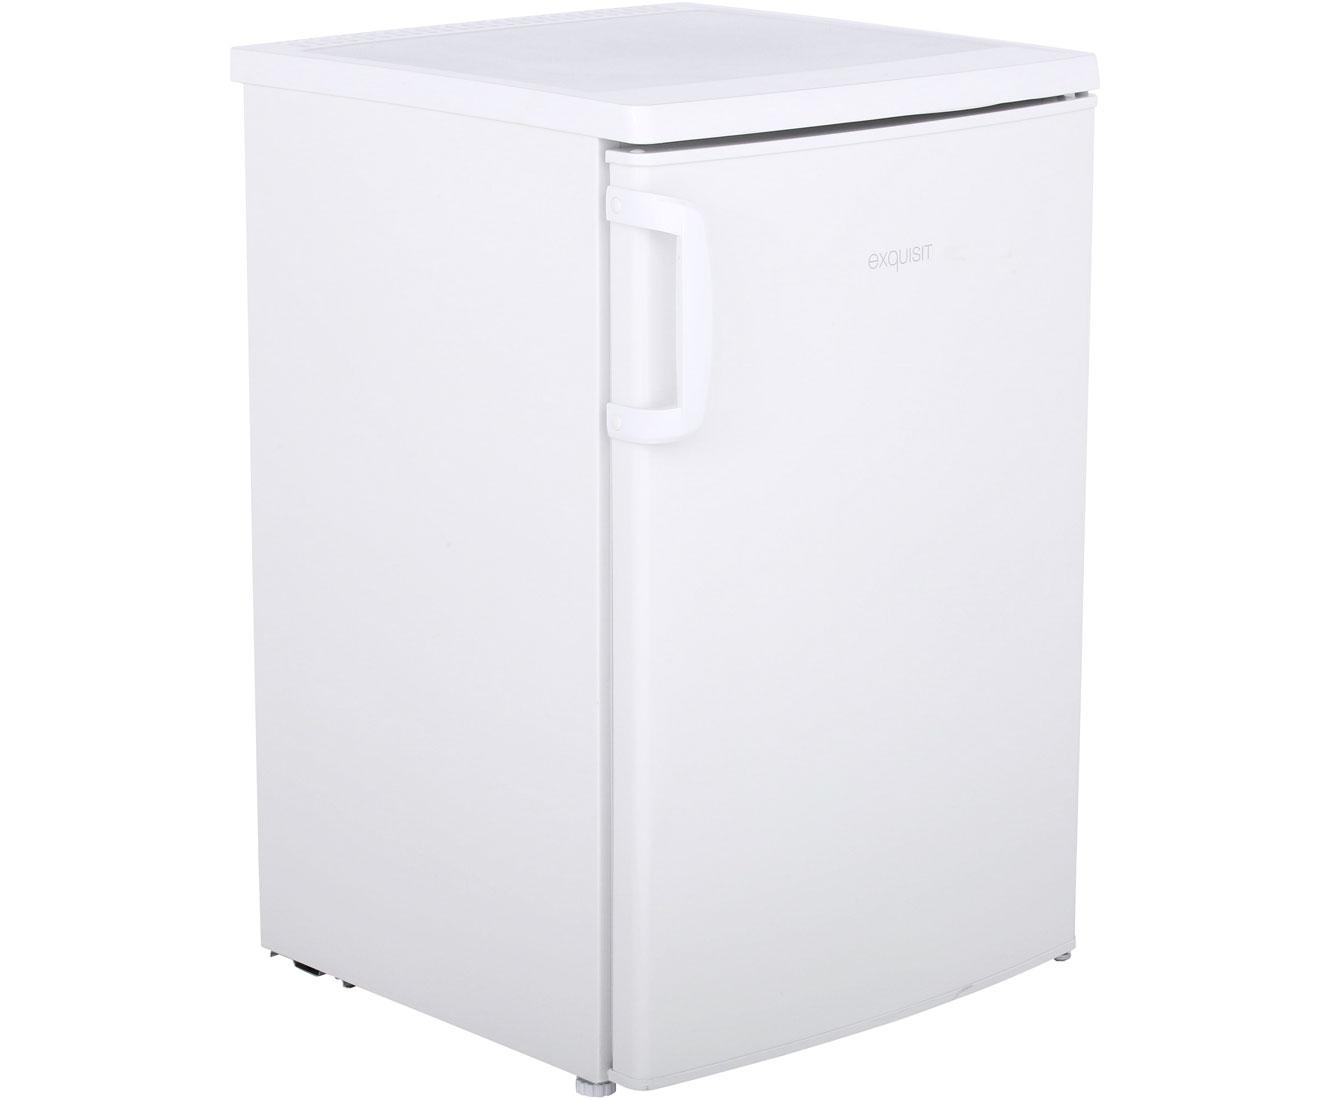 Bomann Kb 167 Kühlbox 50l Mini Kühlschrank A : Rabatt preisvergleich weiße ware u e kühlen gefrieren u e kühlschrank